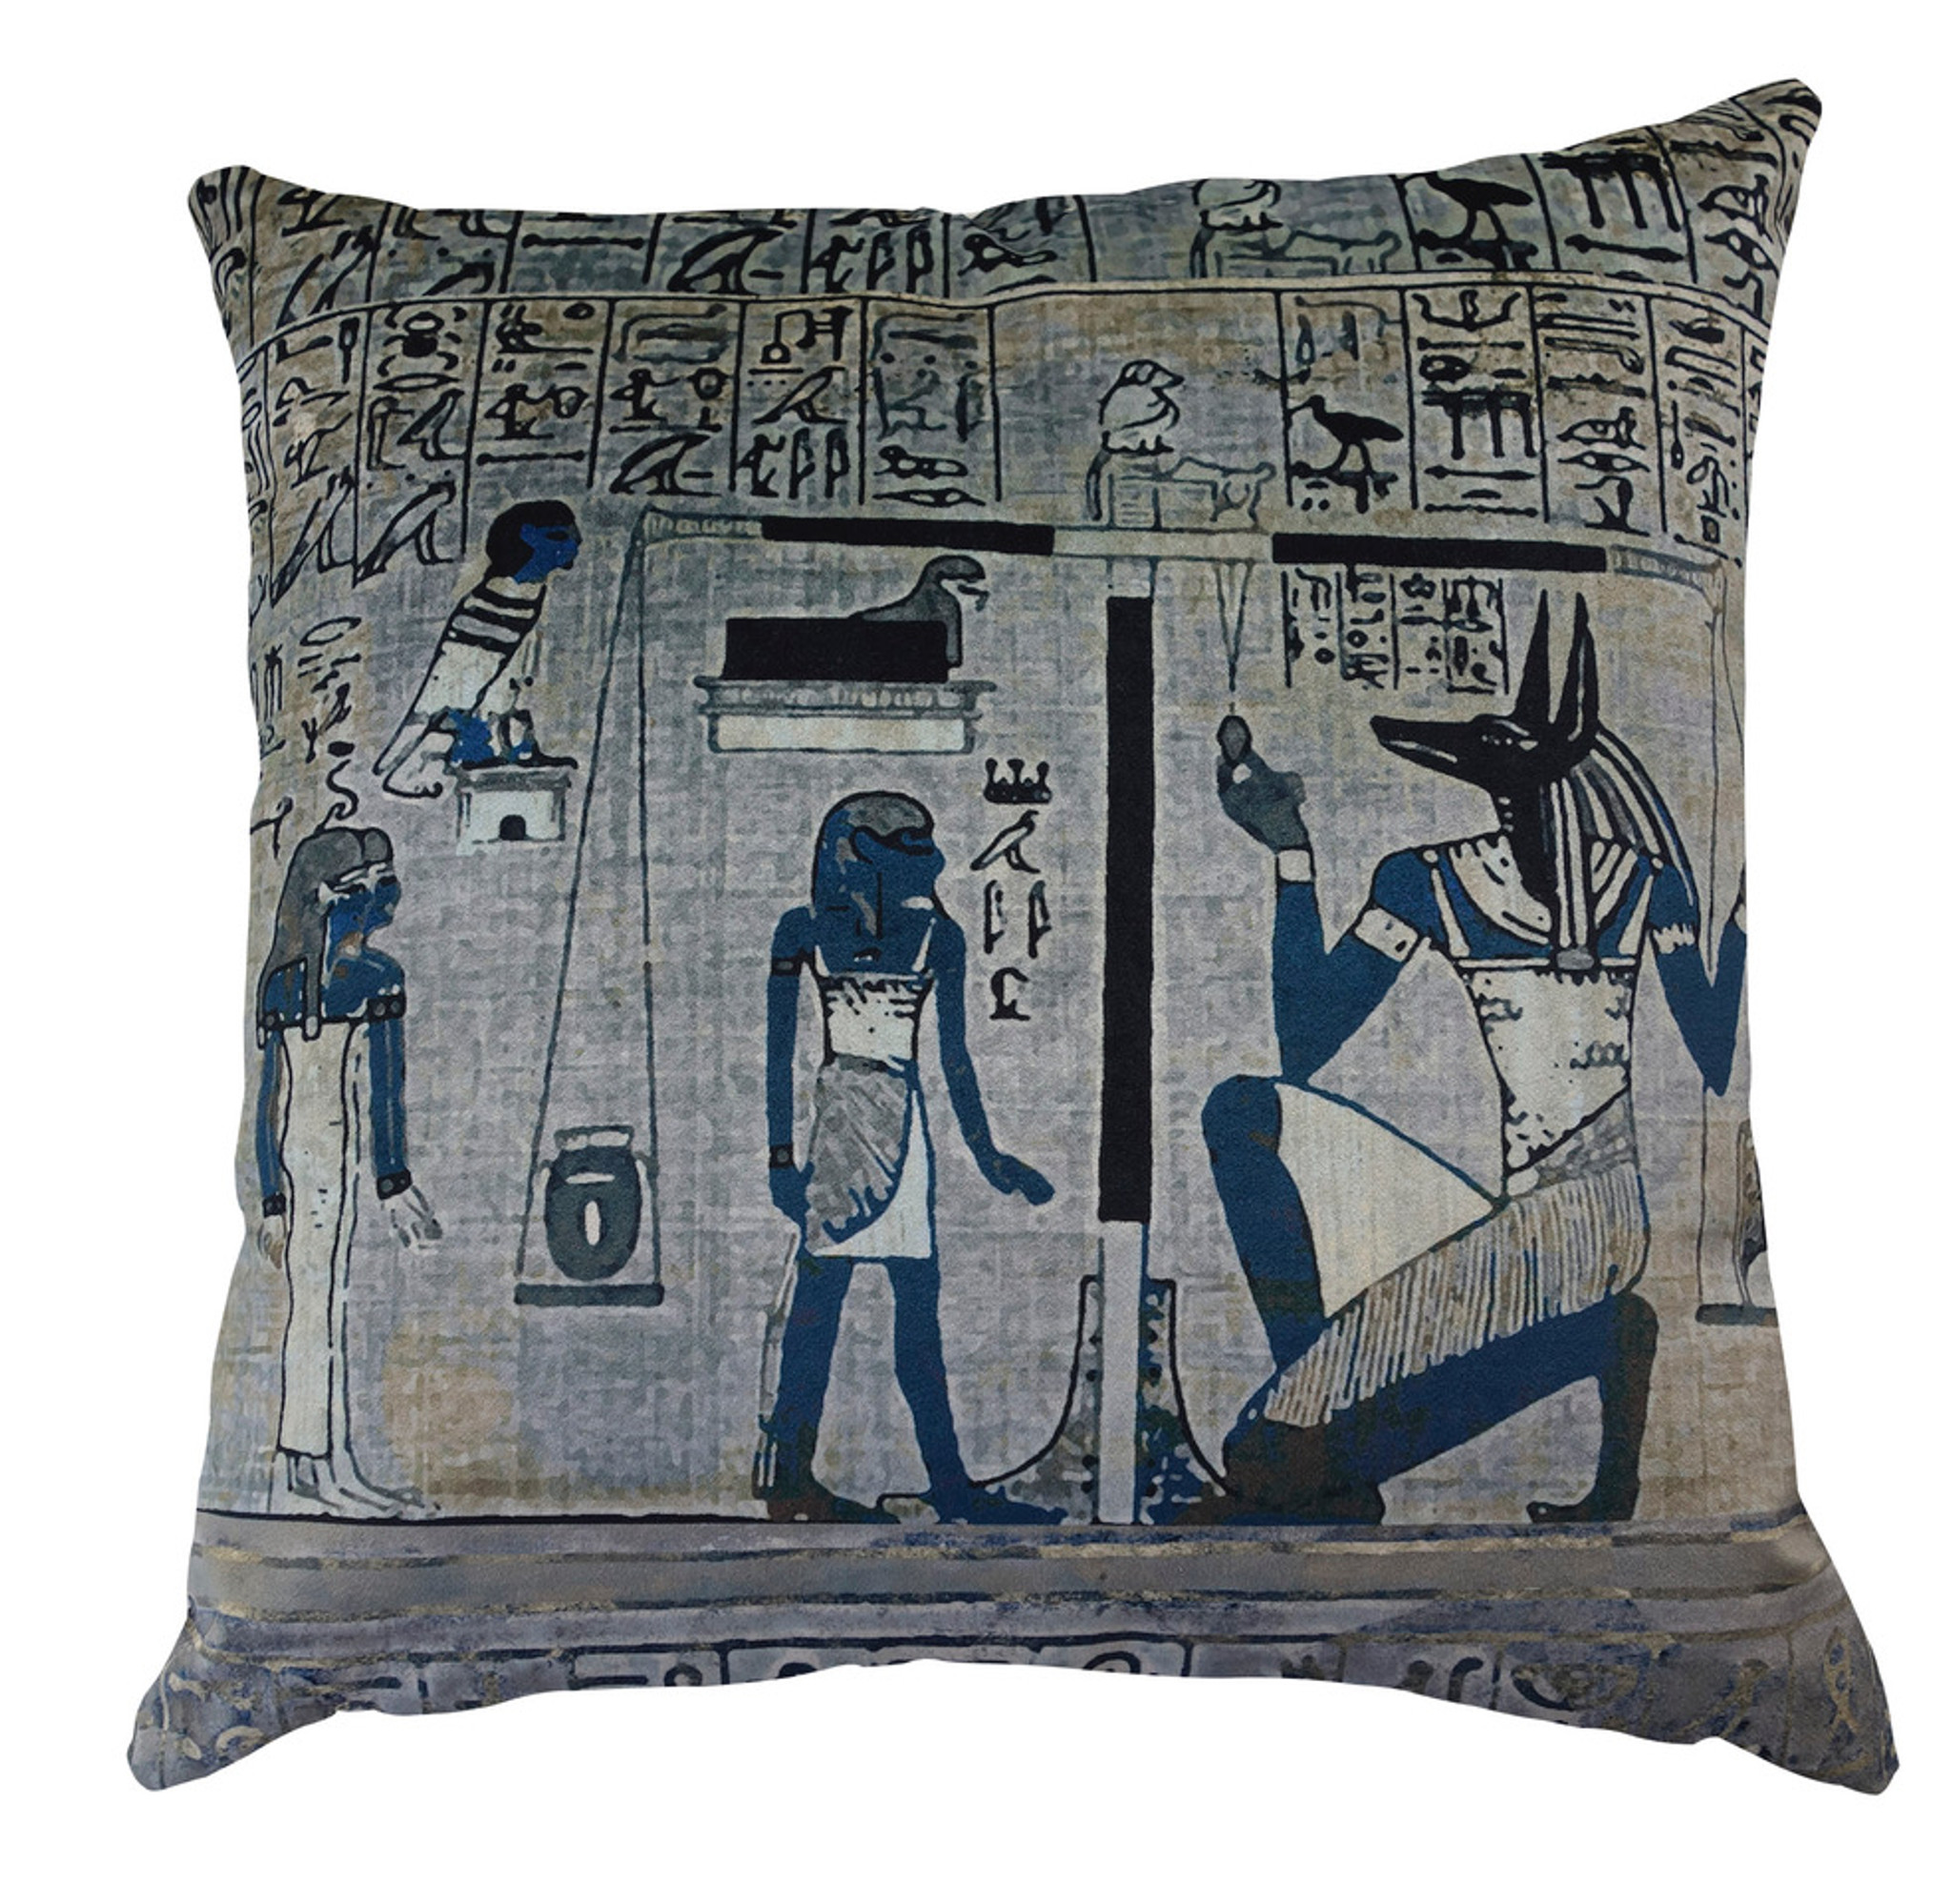 Cushion Cover - Walk Like an Egyptian - the gods